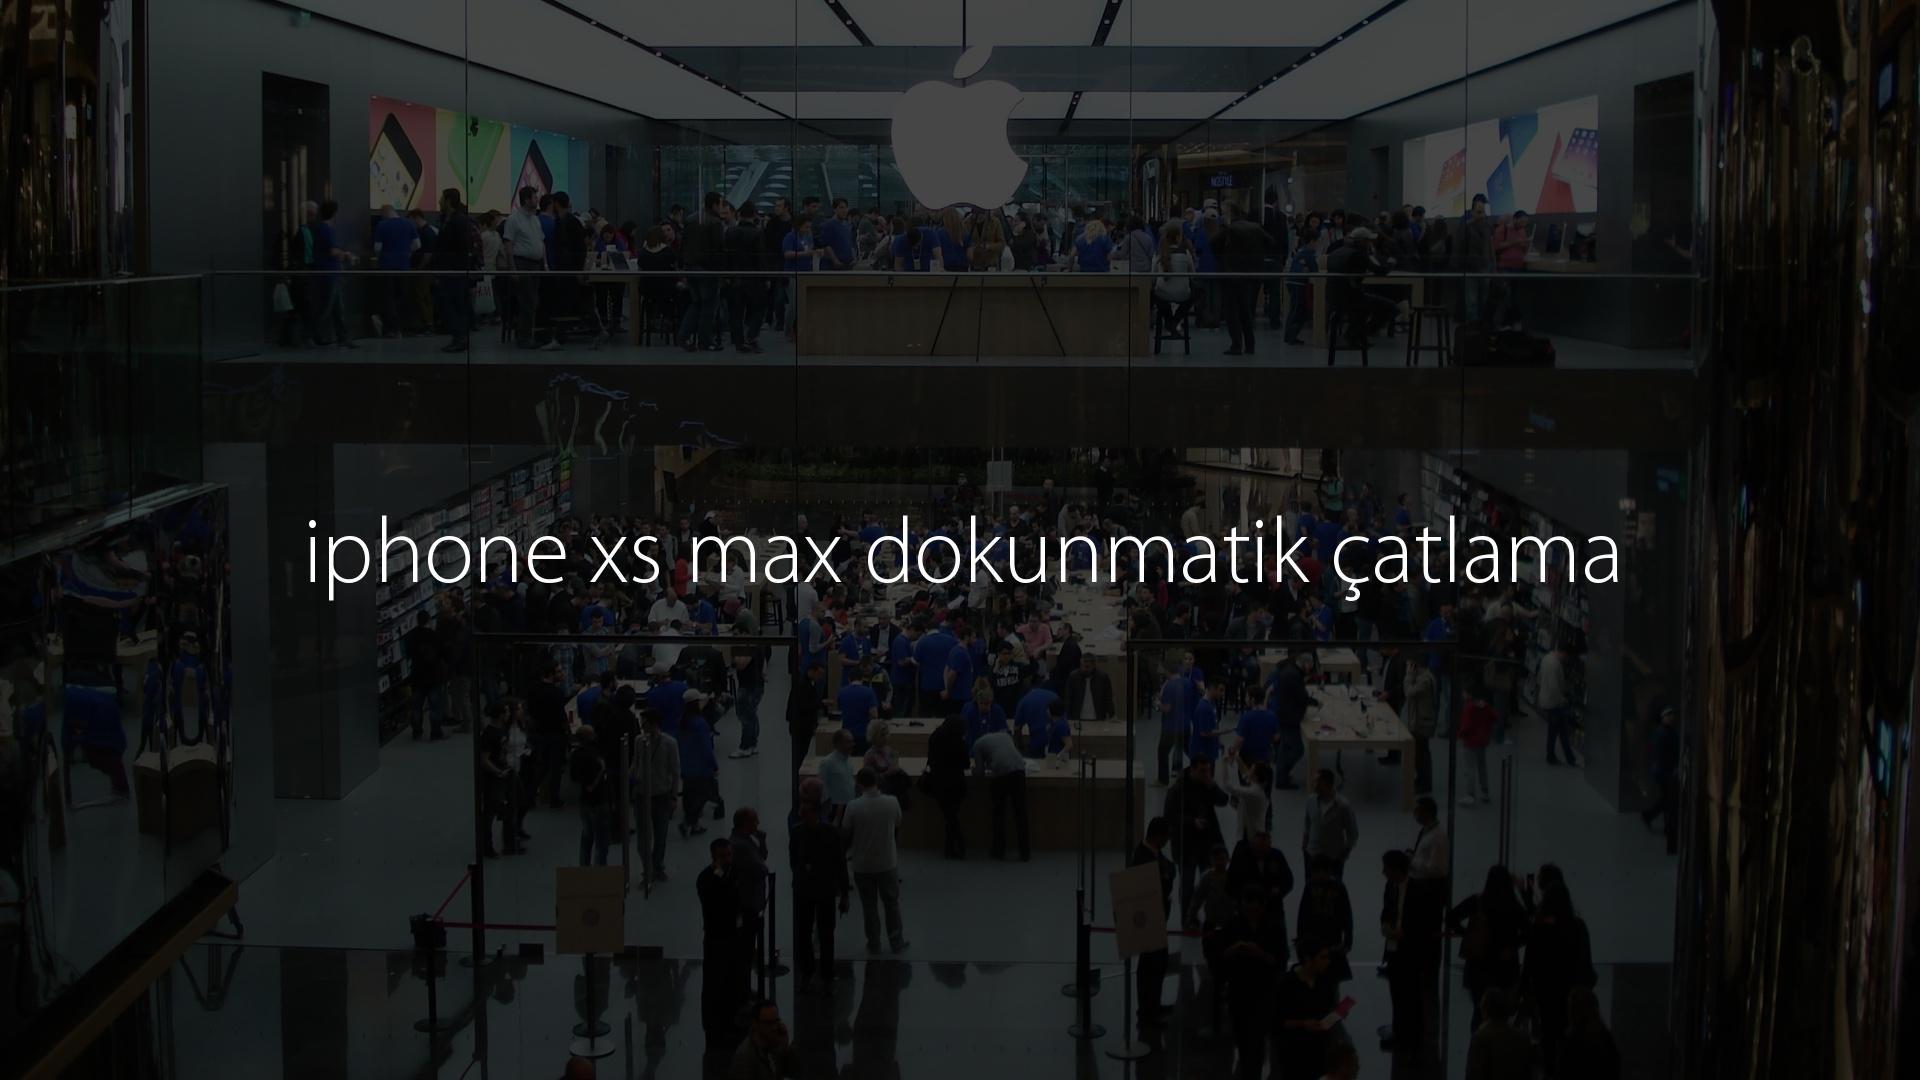 iphone xs max dokunmatik çatlama